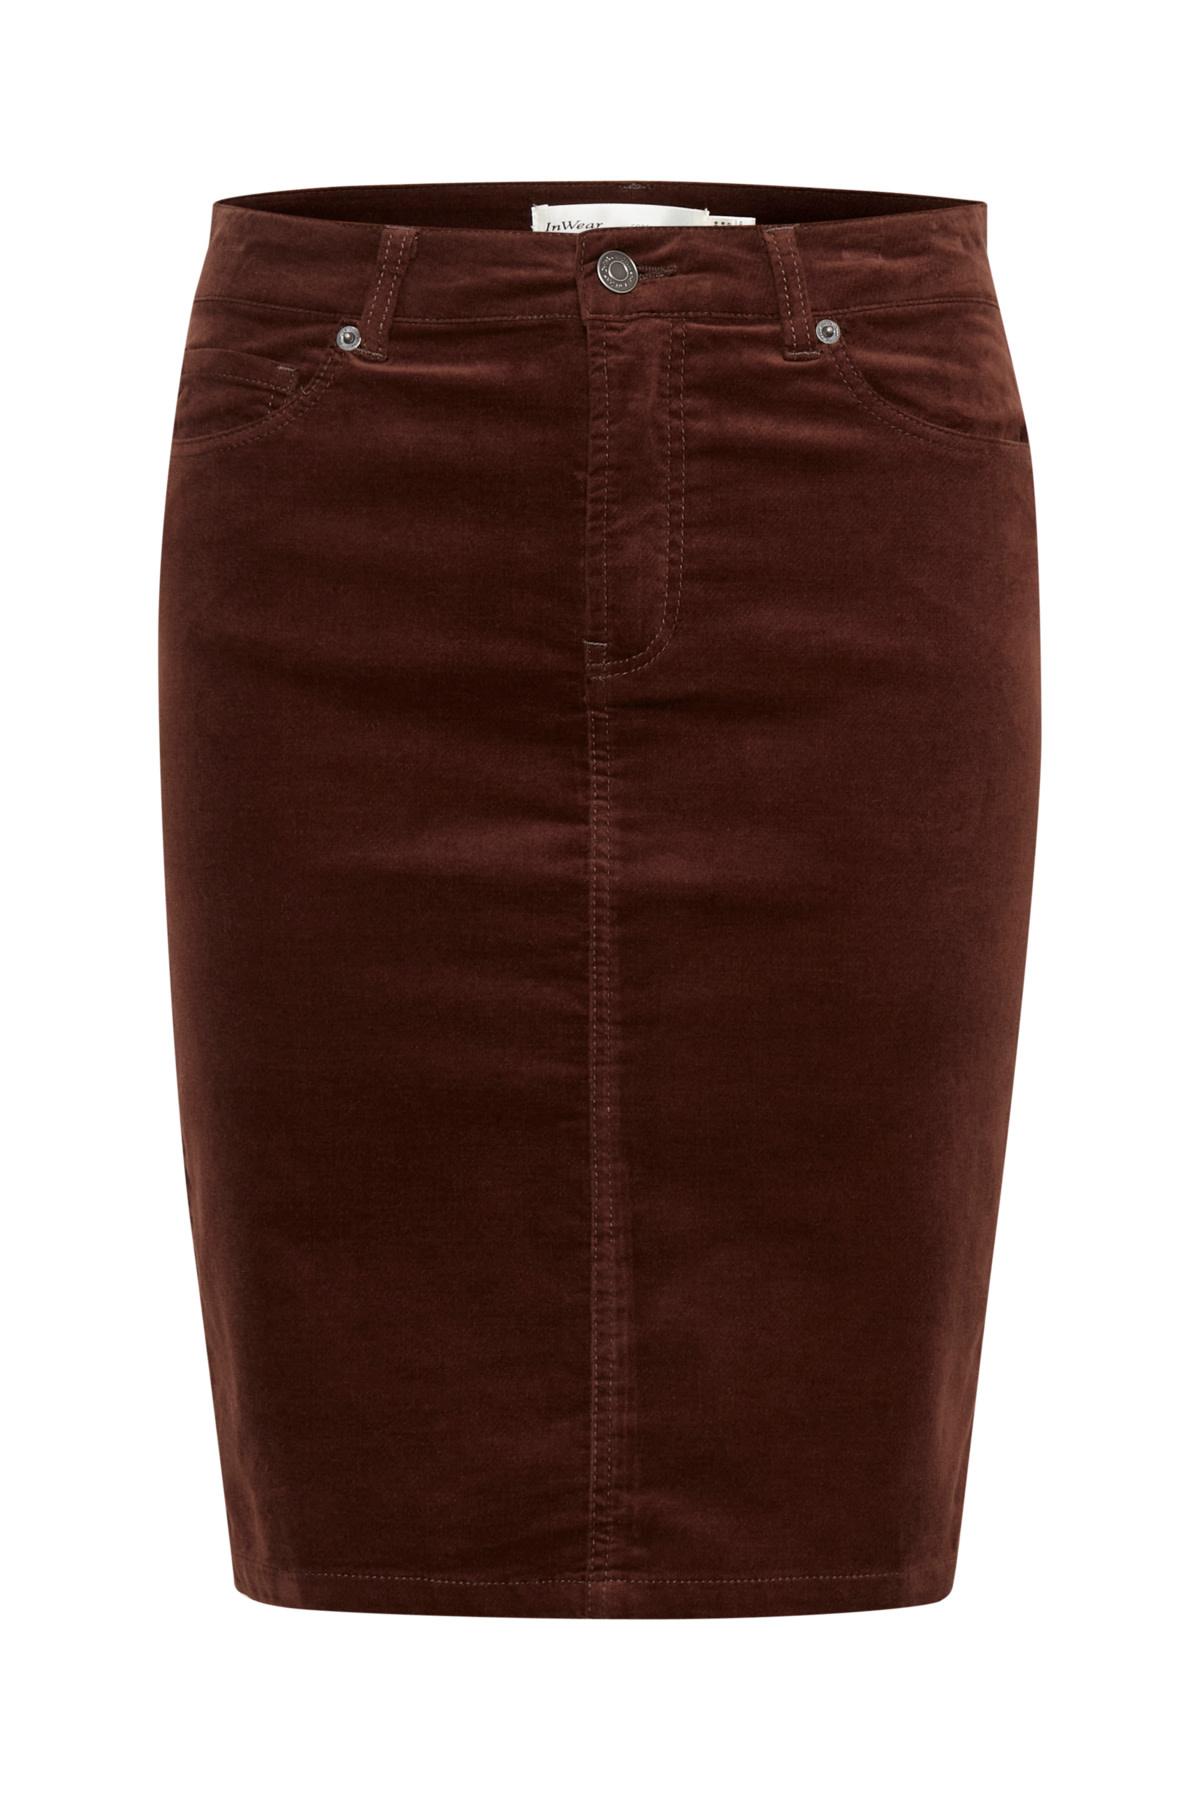 Tille Skirt - Coffee Brown